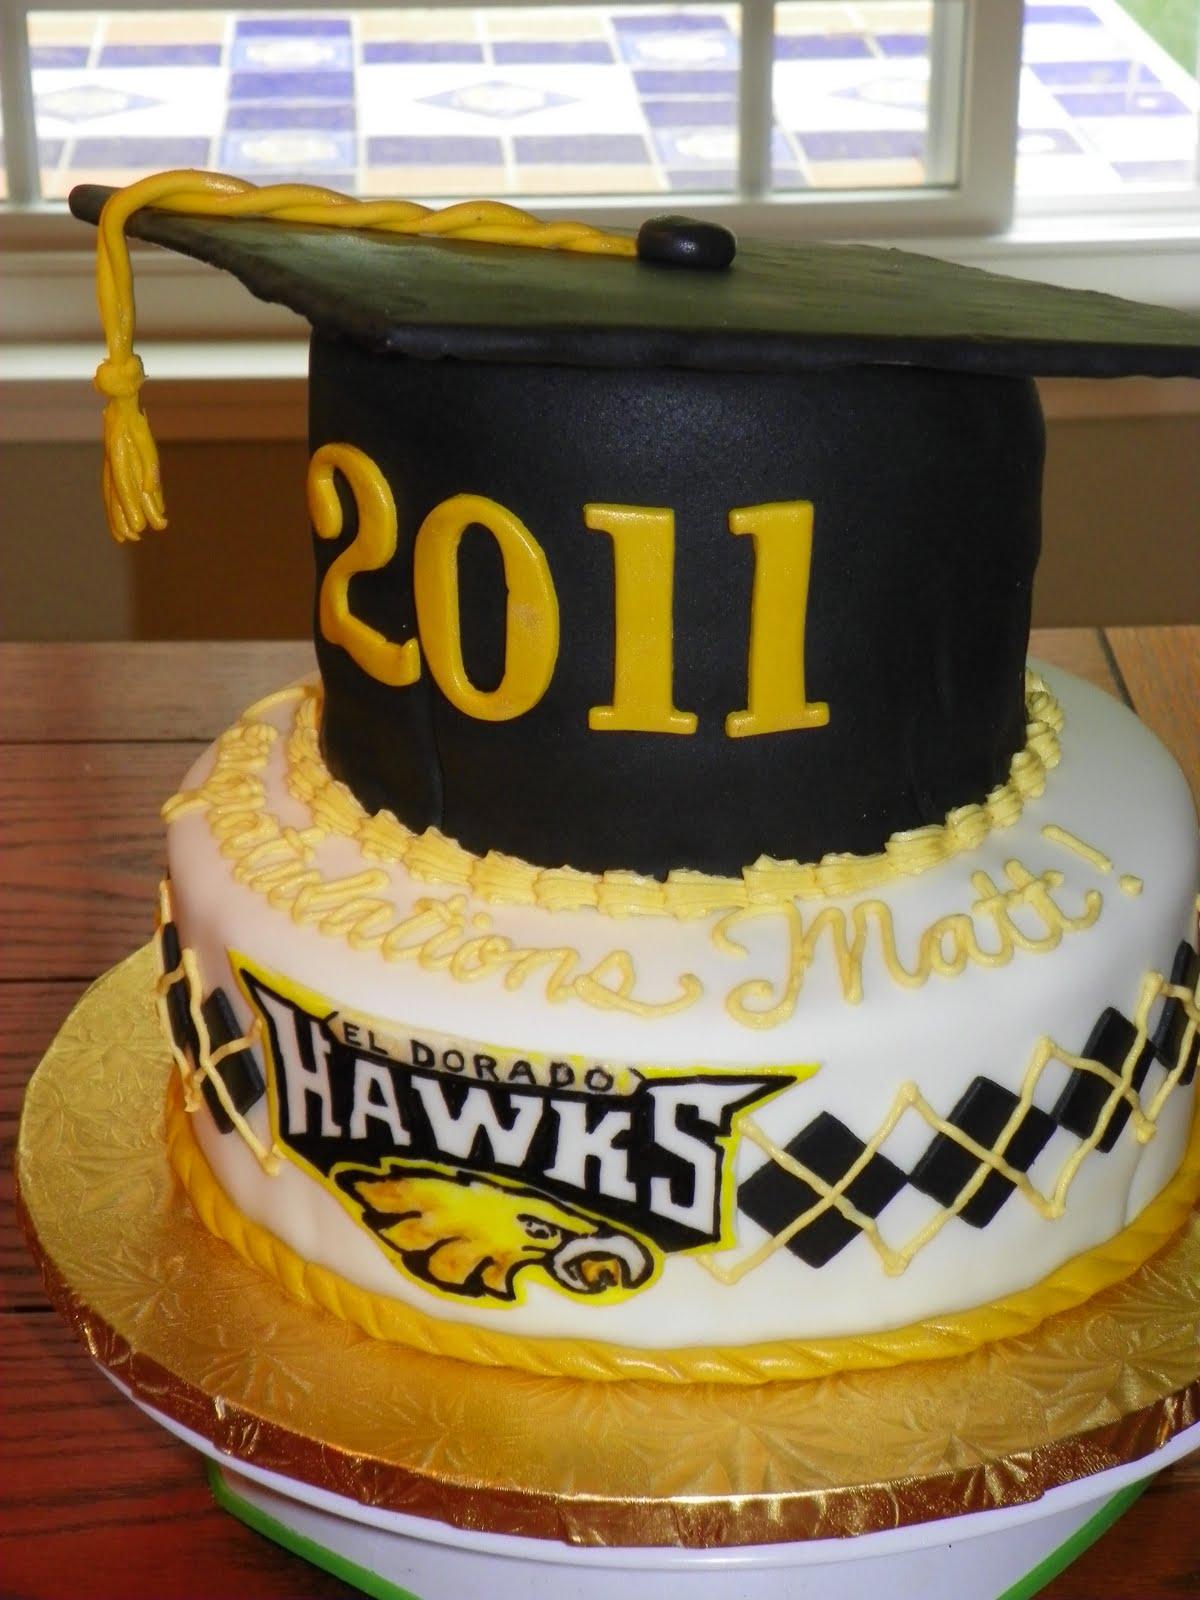 Cake Design School : Plumeria Cake Studio: El Dorado High School Graduation Cake